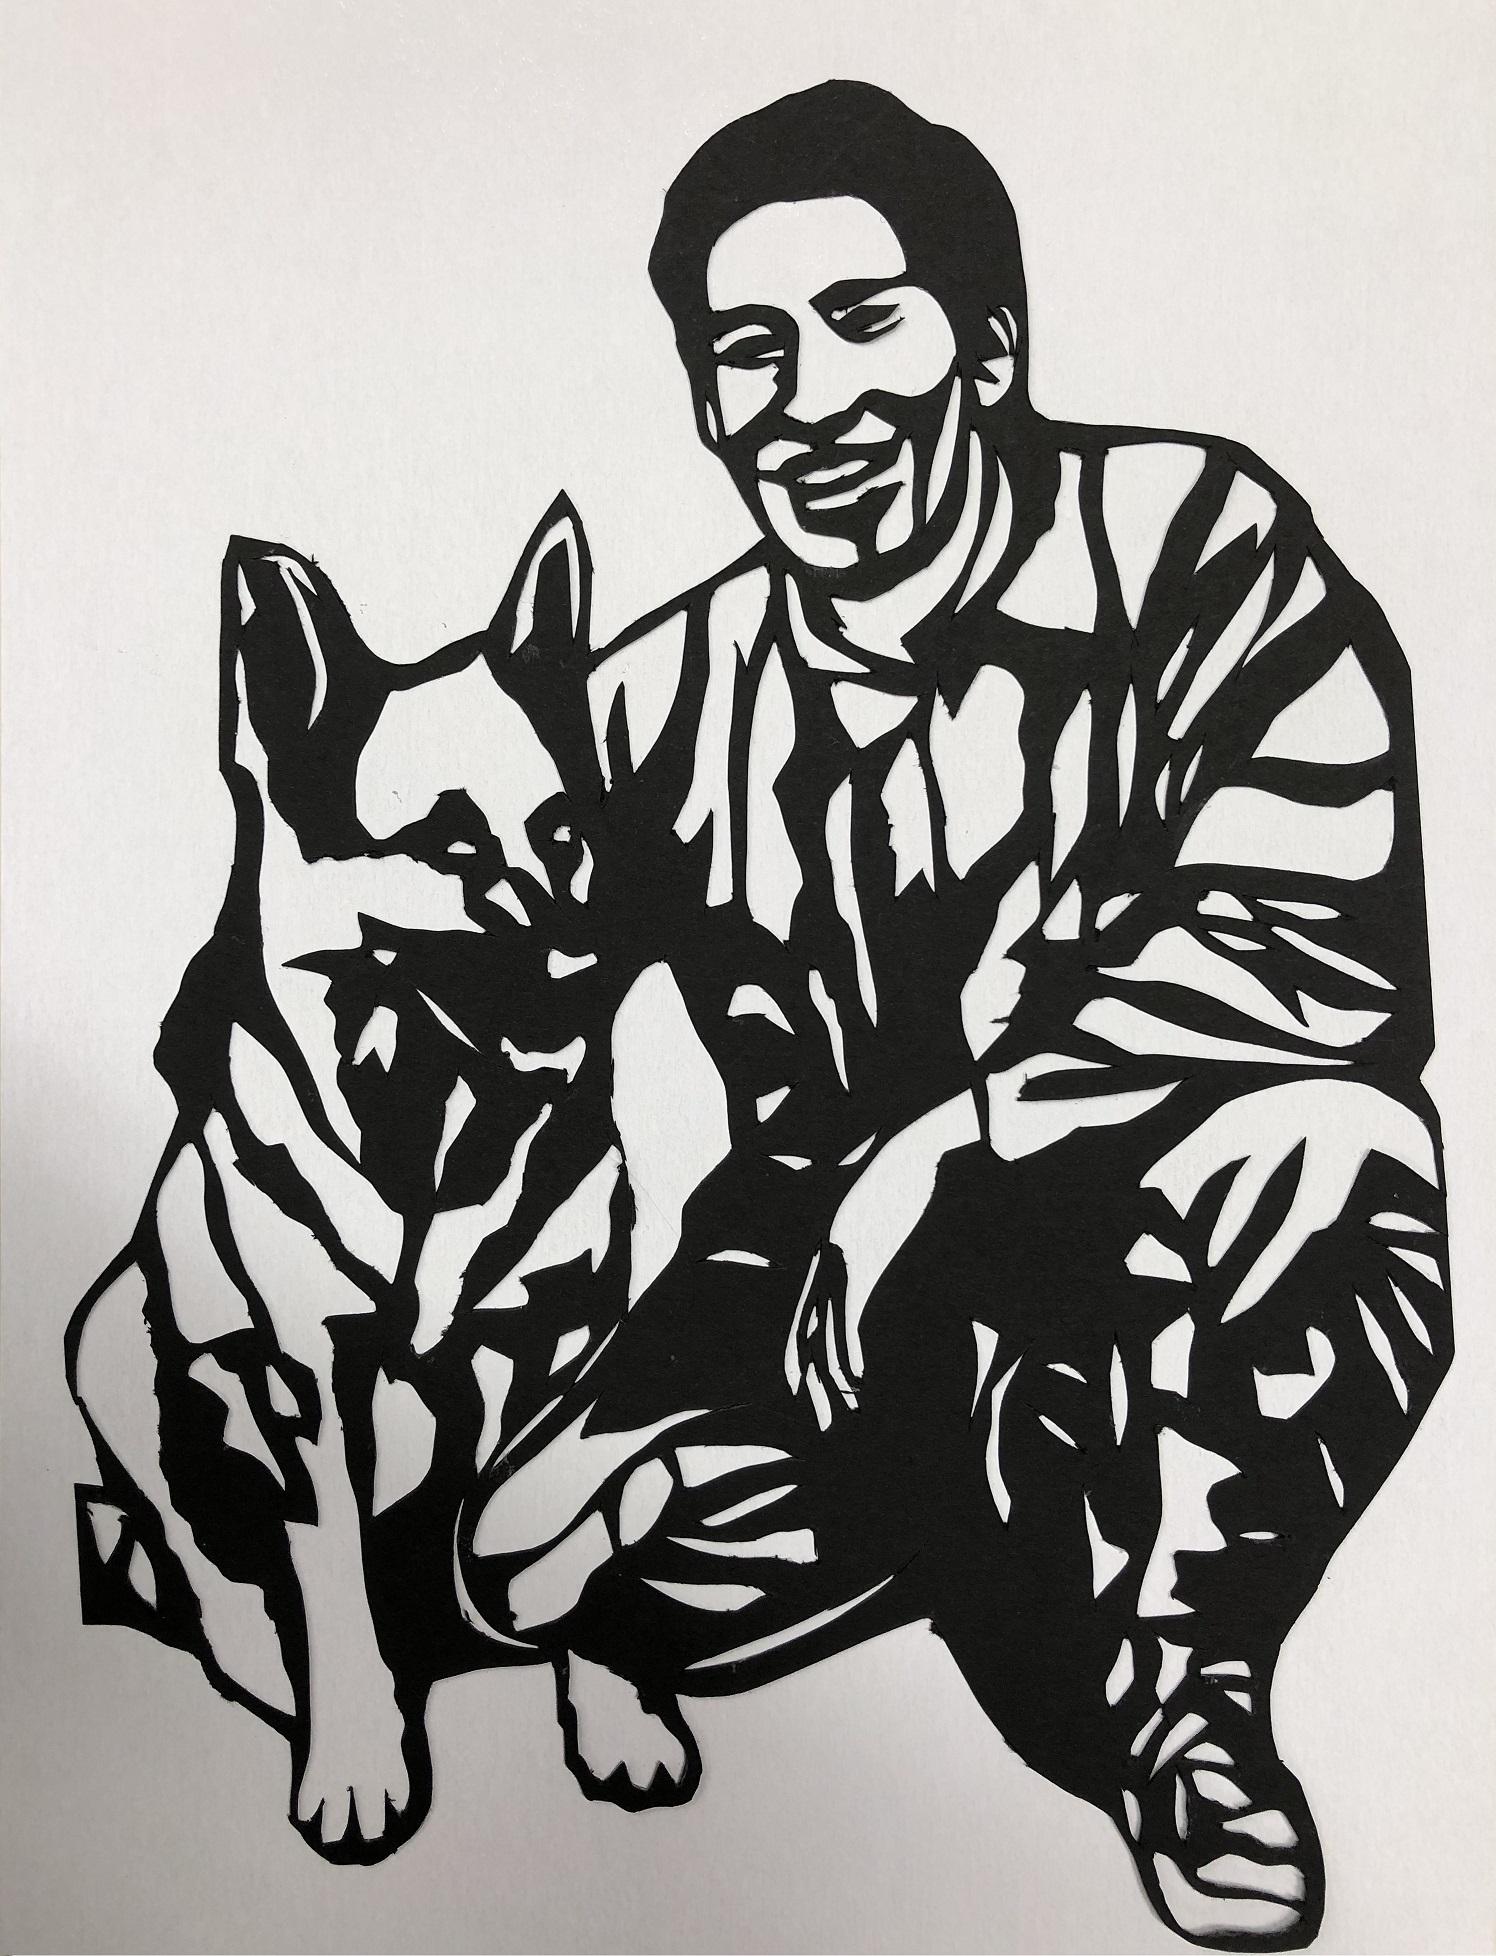 a盲導犬_5862 - コピー